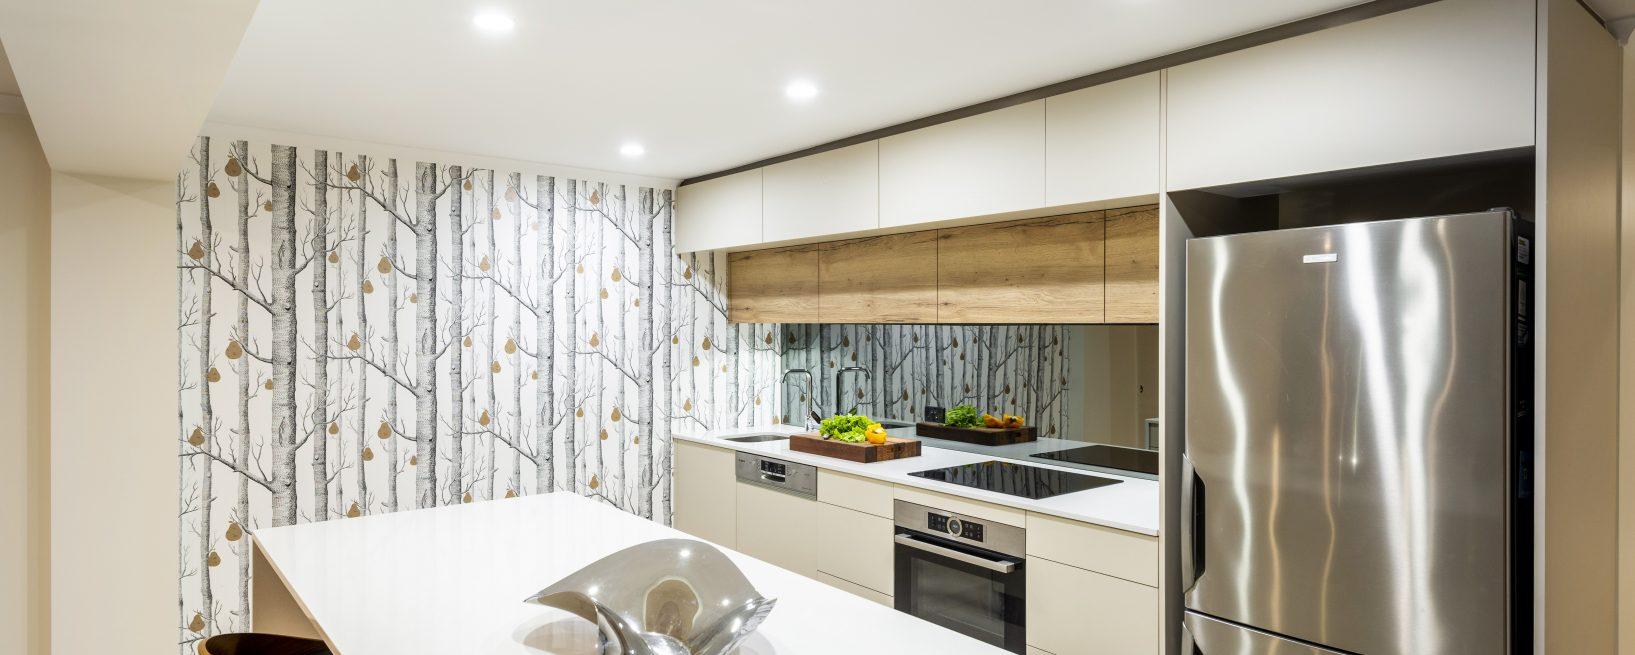 Kitchen Renovation brisbane